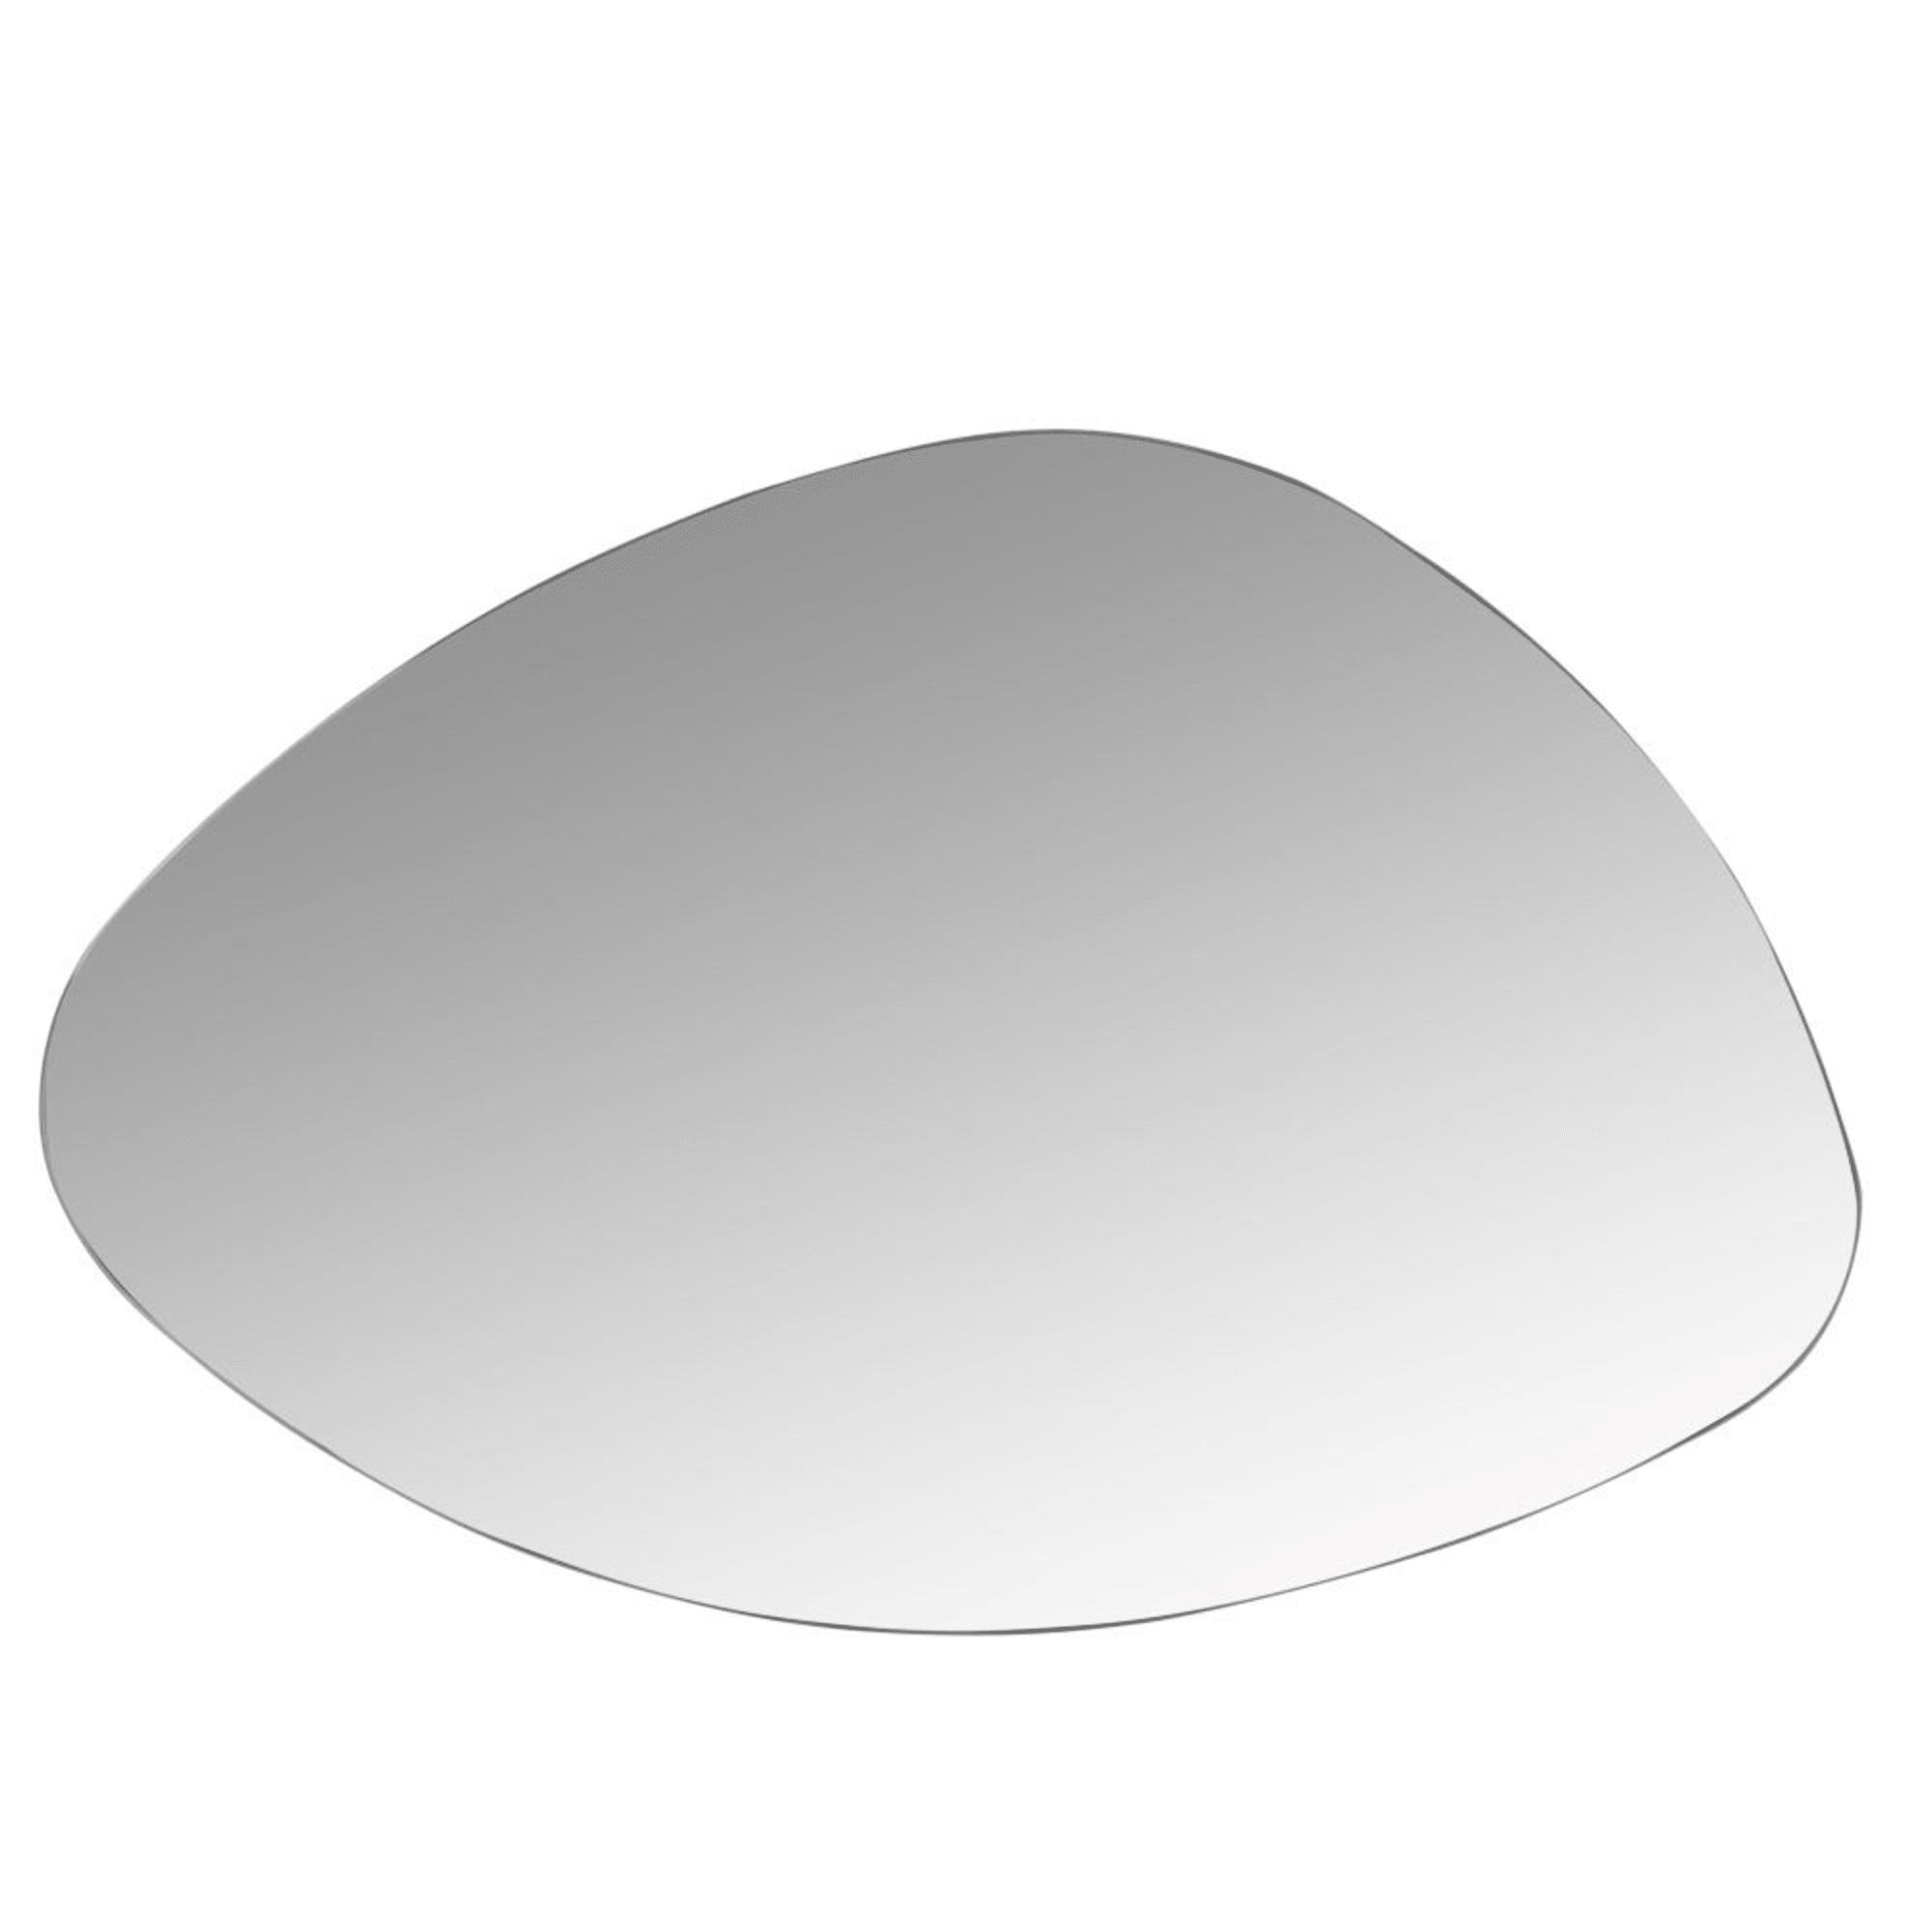 Où trouver un miroir galet